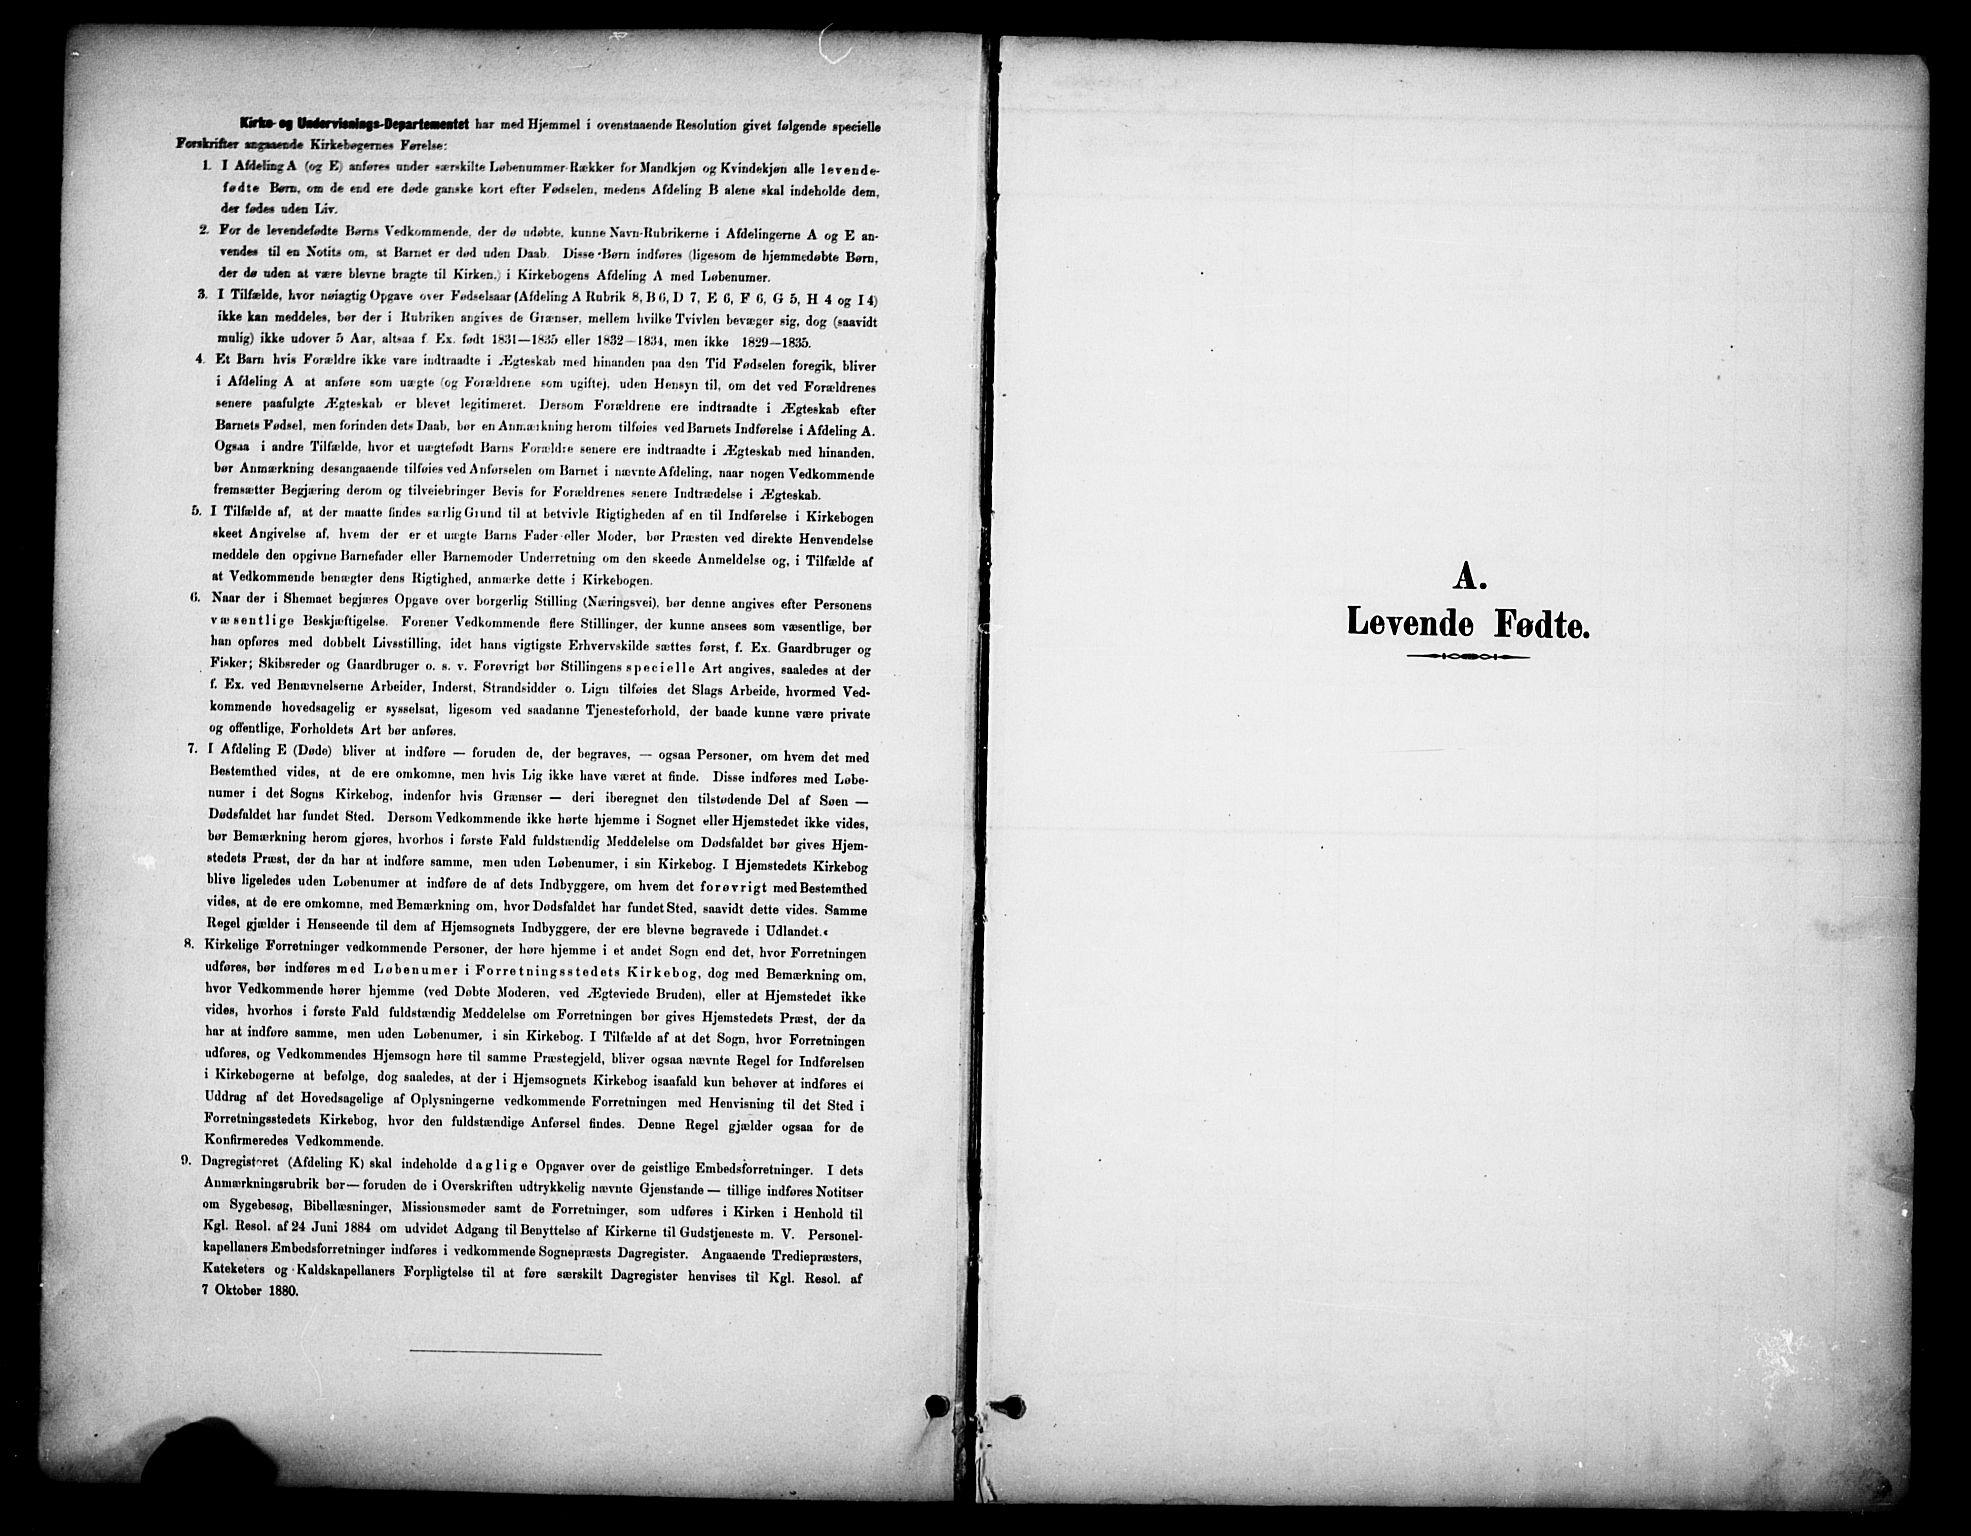 SAH, Dovre prestekontor, Ministerialbok nr. 3, 1891-1901